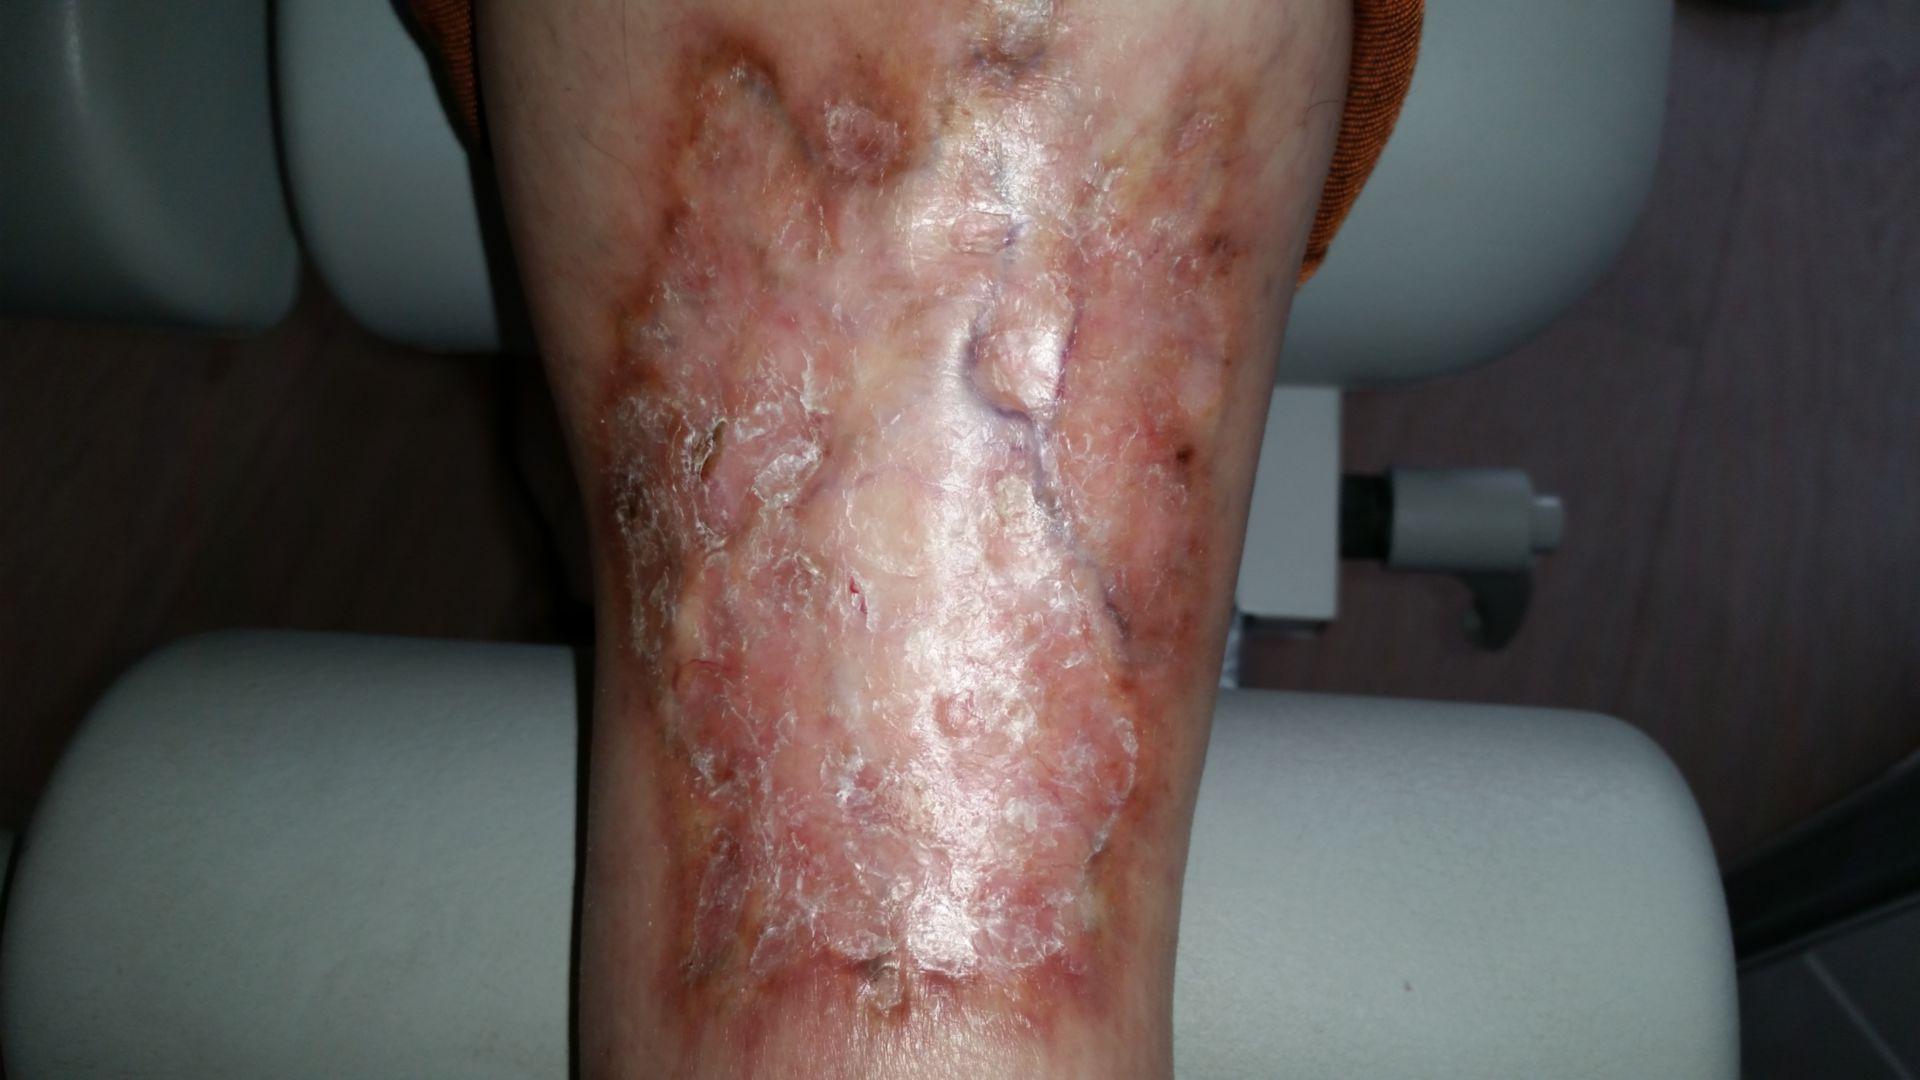 Necrobiosis lipoidoca diabeticorum